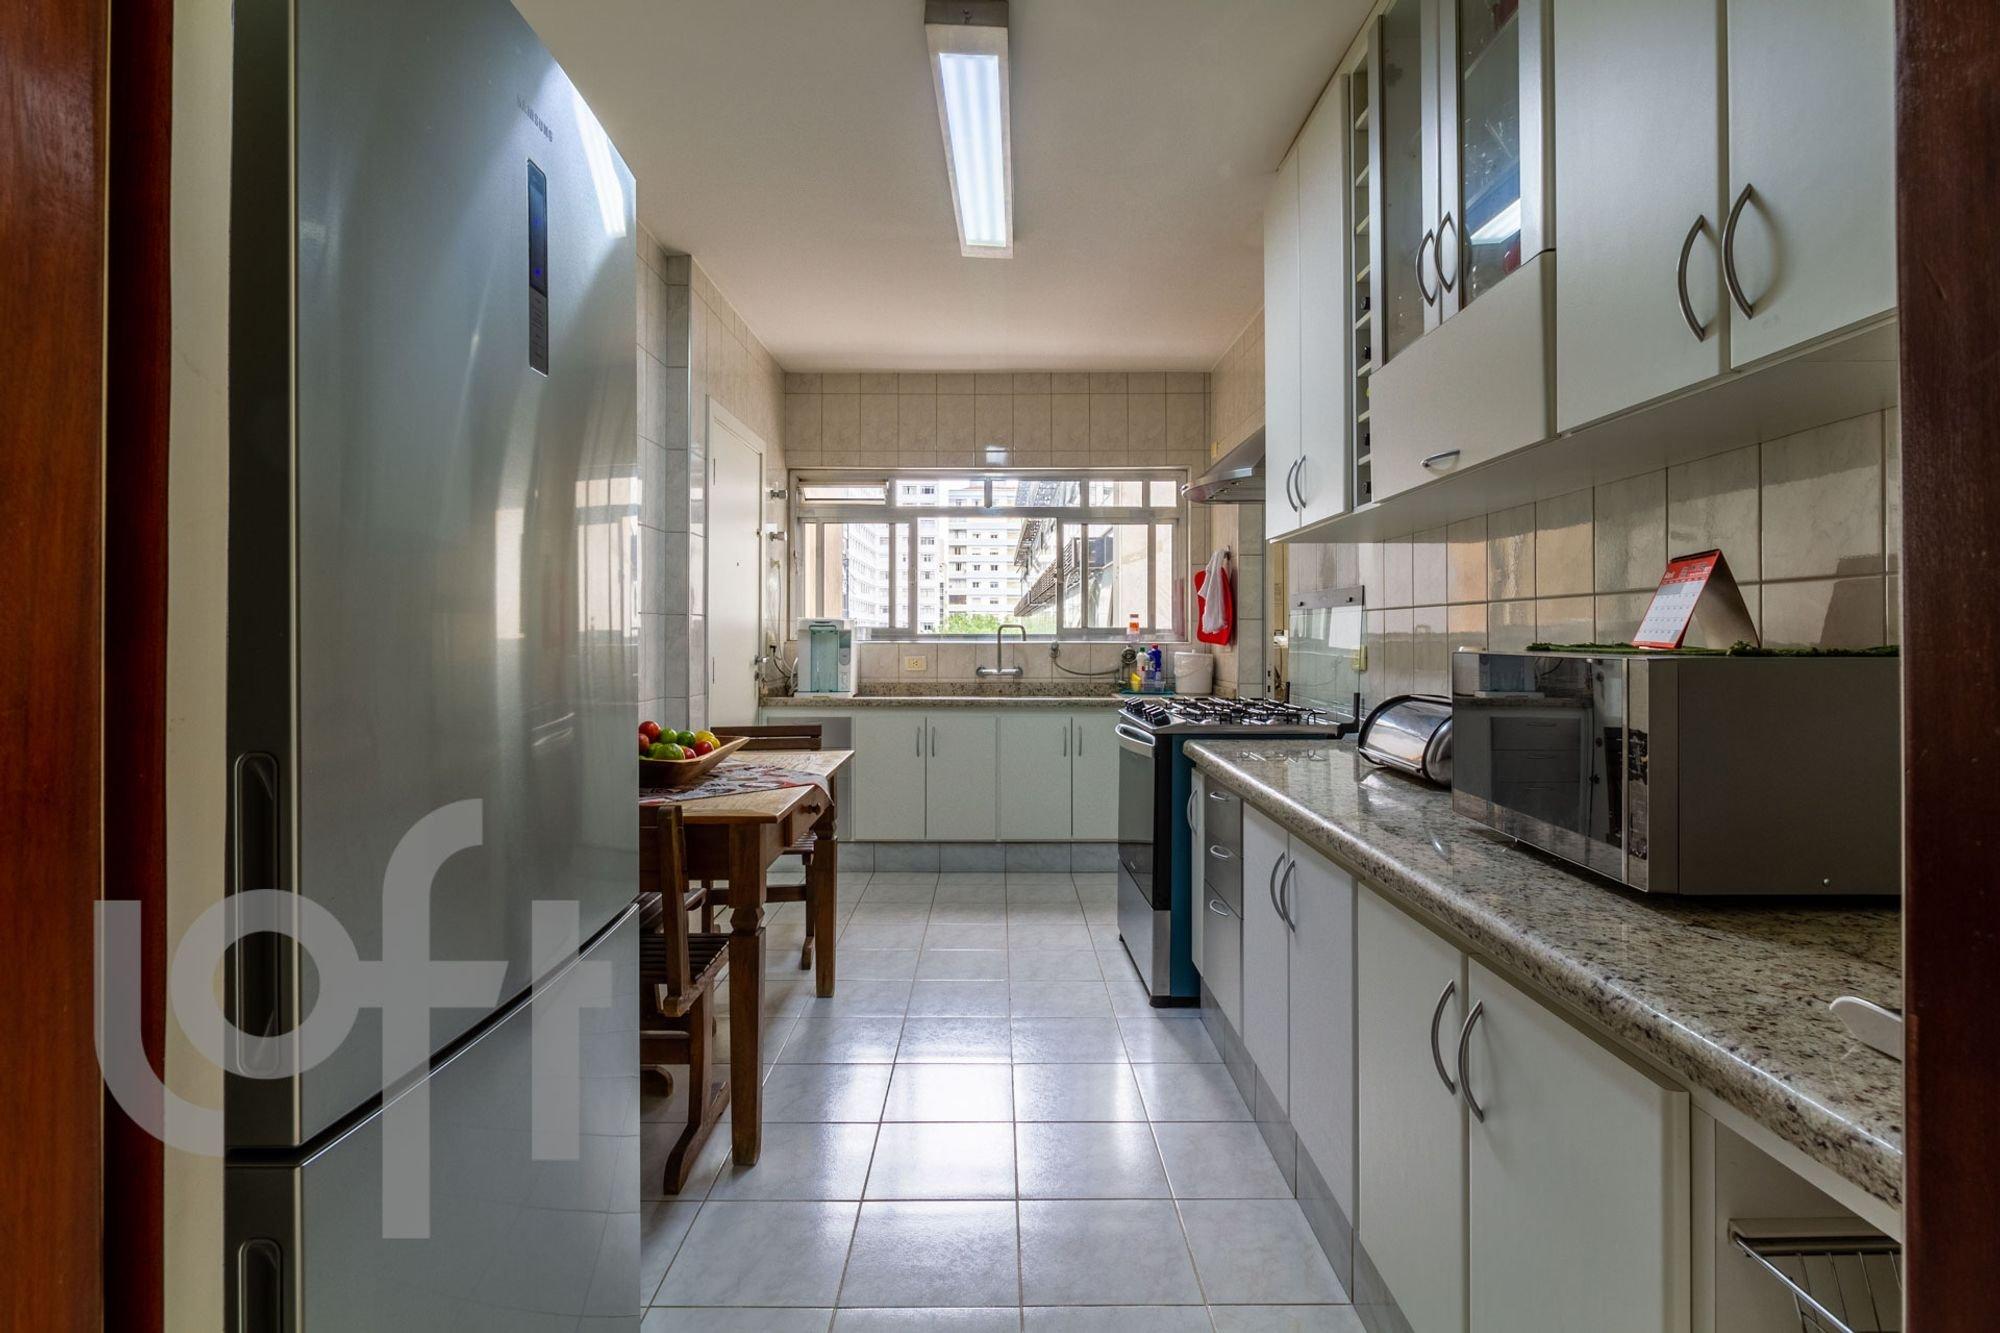 Foto de Cozinha com garrafa, tigela, microondas, mesa de jantar